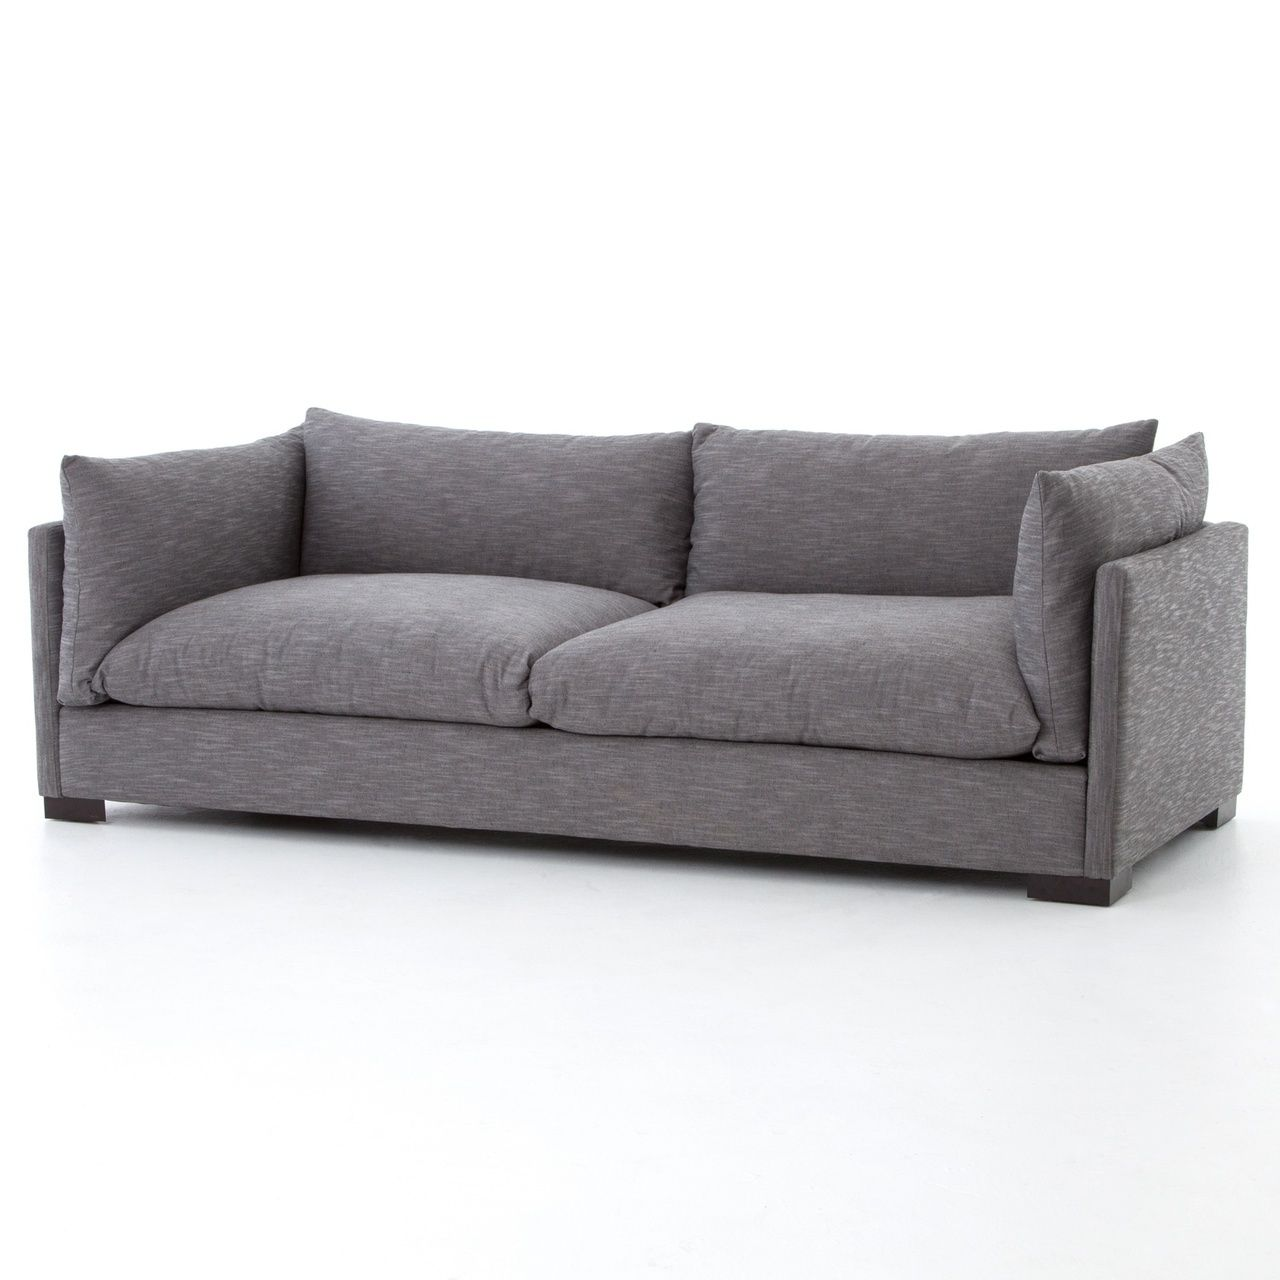 Westworld Loft Gray Silver Lounge Sofa 90 Lounge Sofa Pallet Furniture Wood Sofa